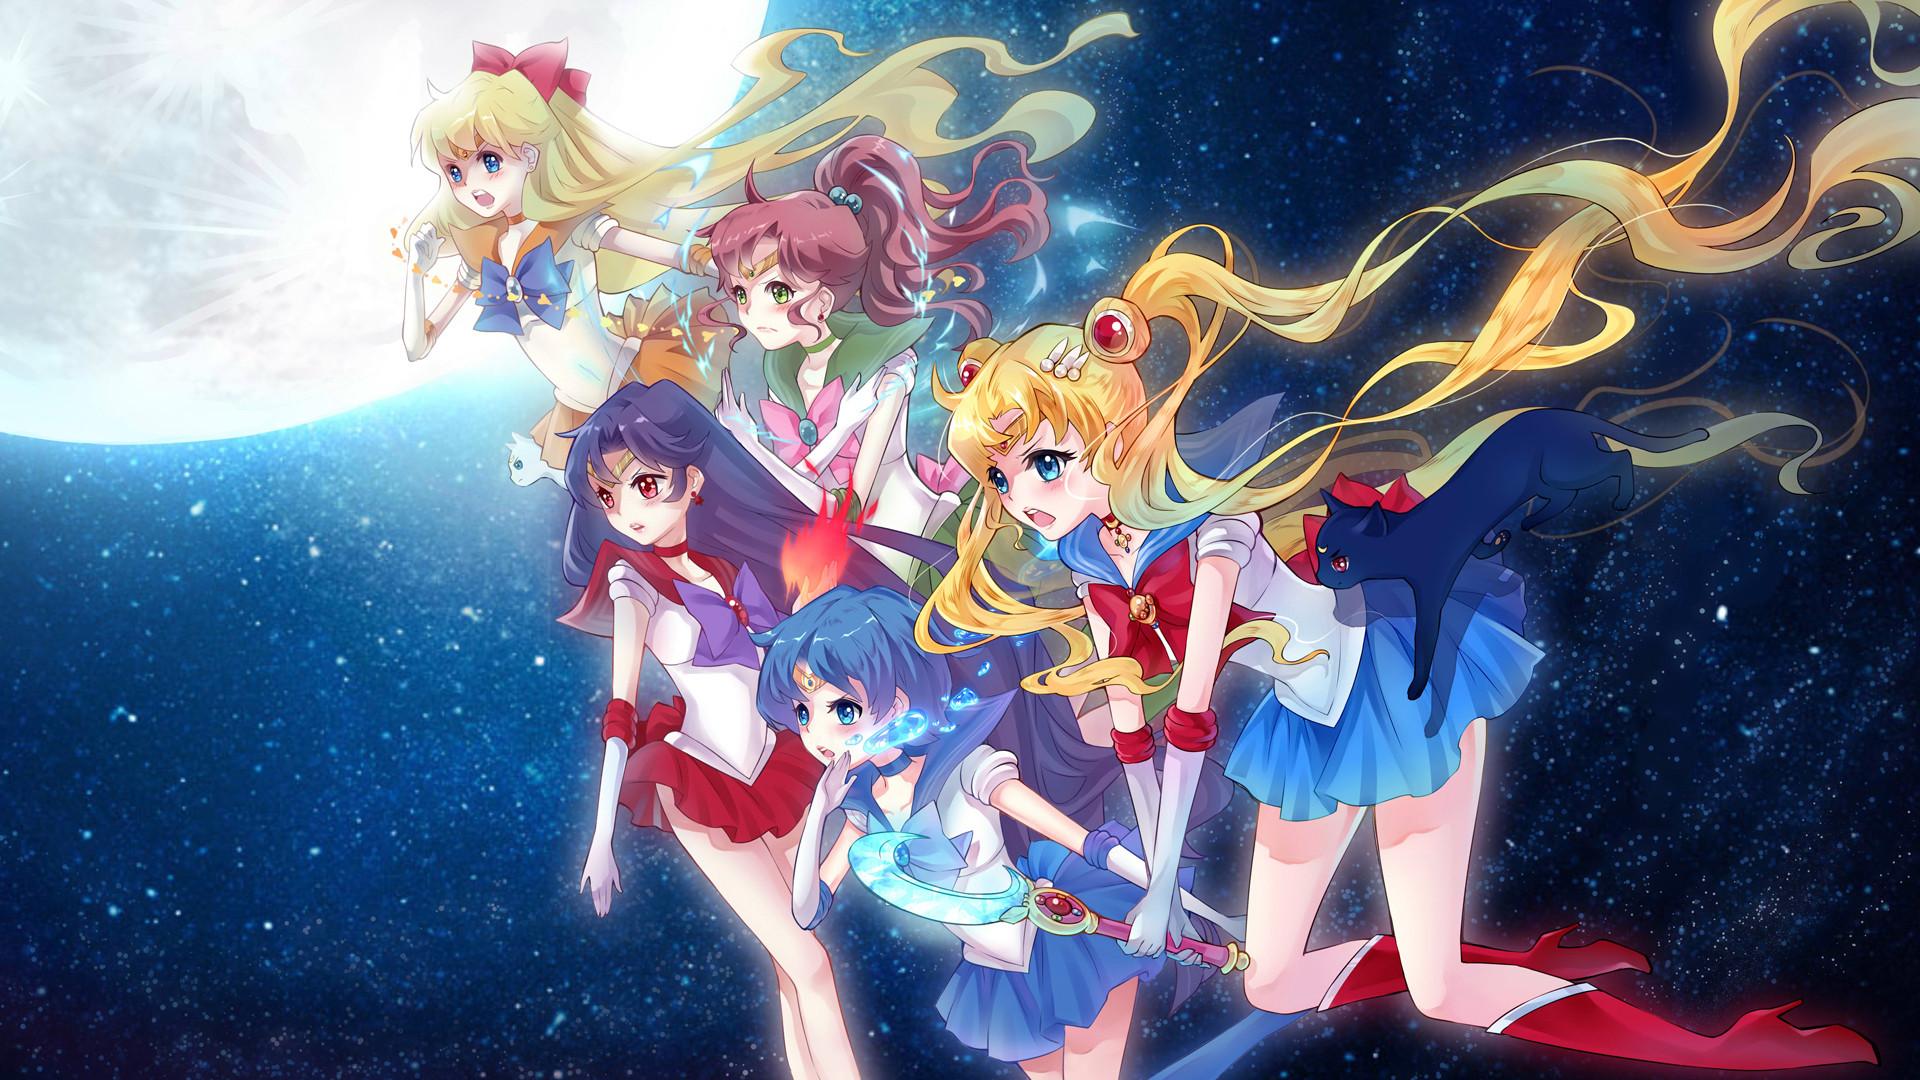 225 Sailor Moon Wallpaper 1920 1080